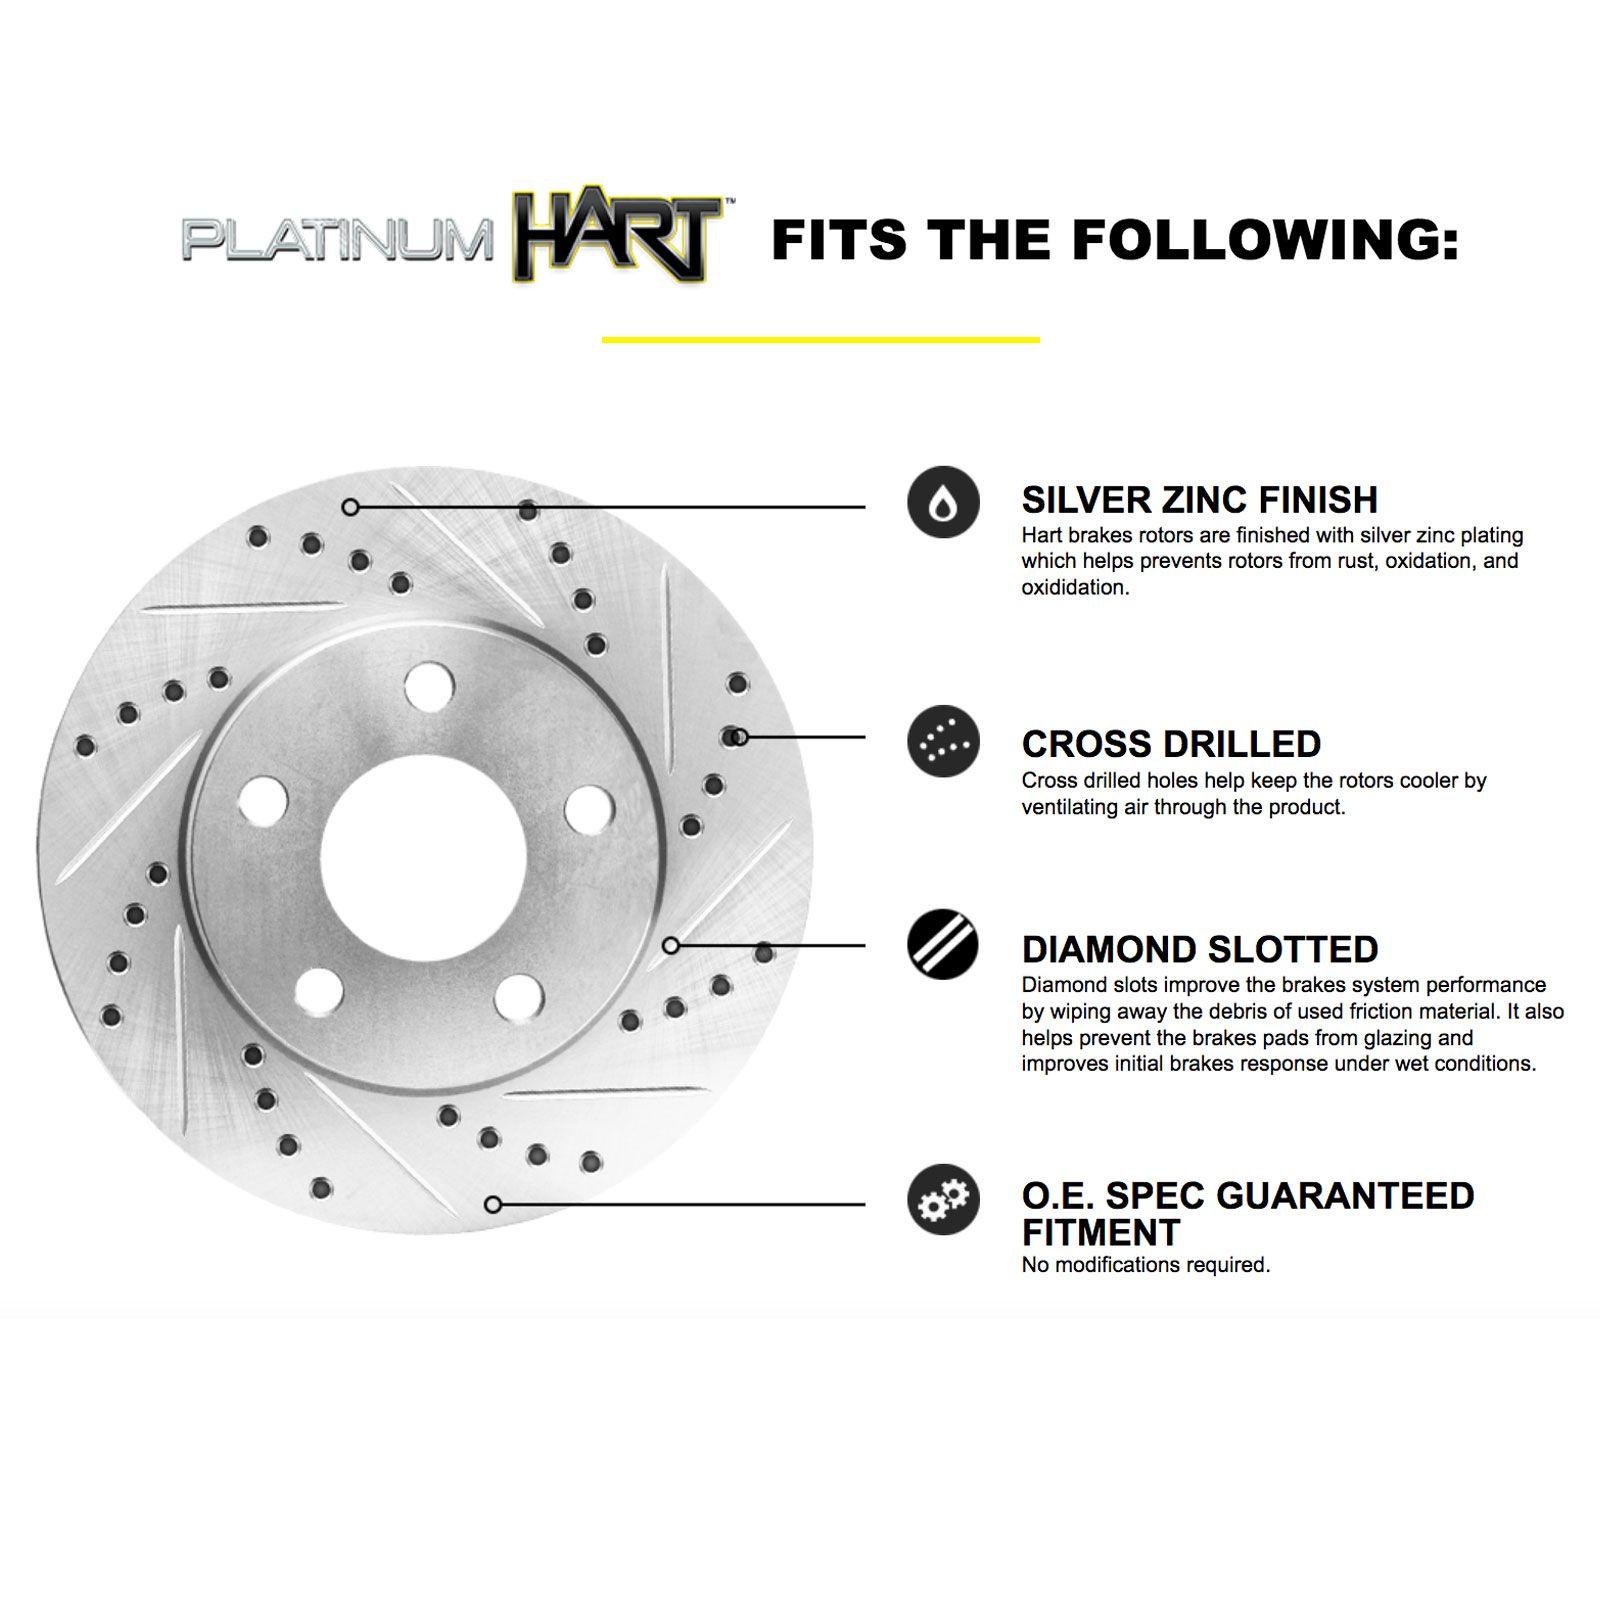 For 2003-2014 Volvo XC90 Hart Brakes Rear Low Dust Ceramic Brake Pads